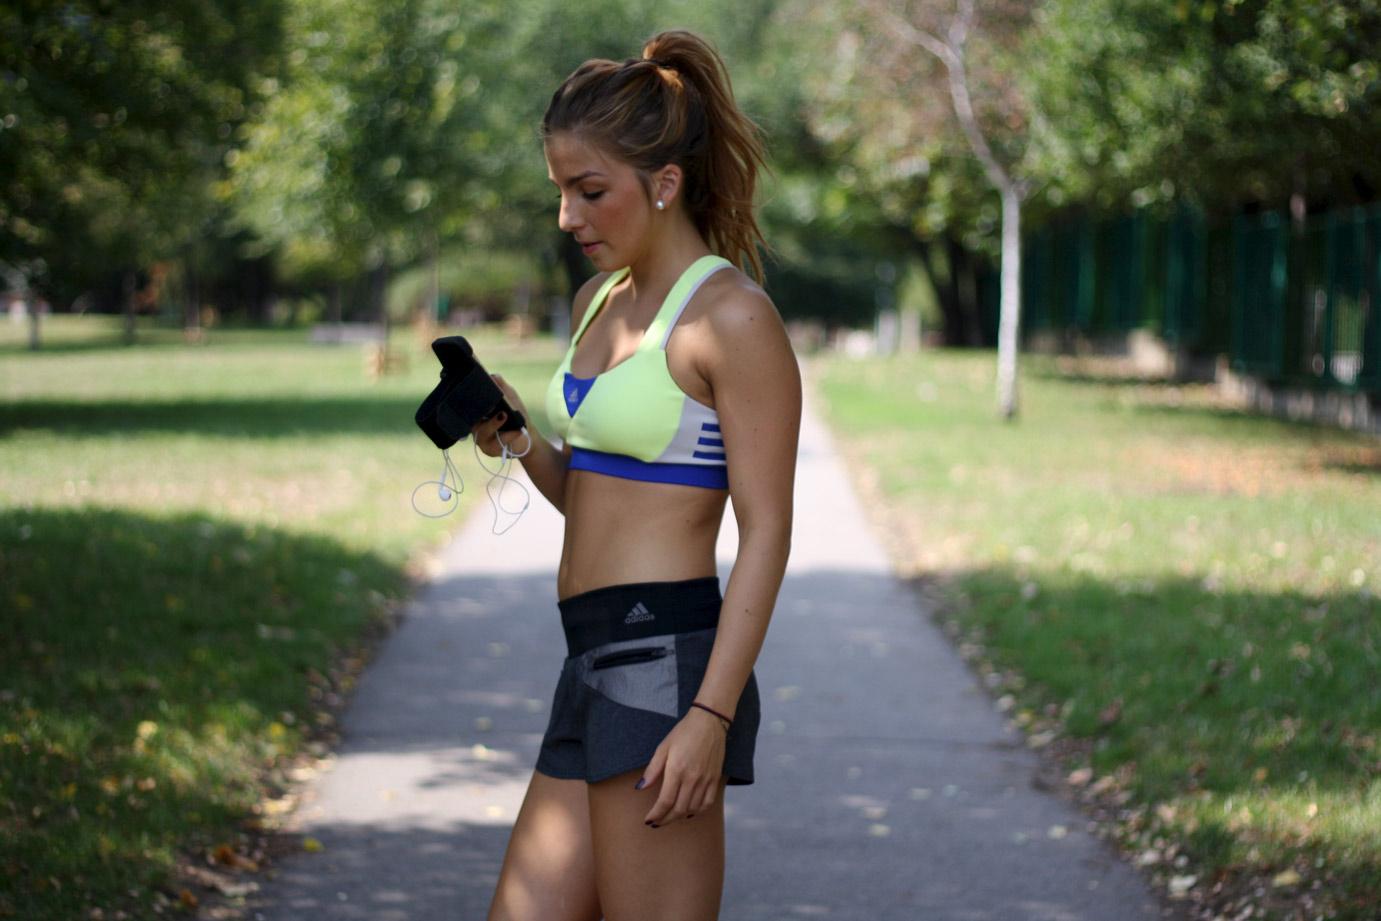 #ADIDASBLOGGERSCHALLENGE - THE BEST RUNNING OUTFIT 6